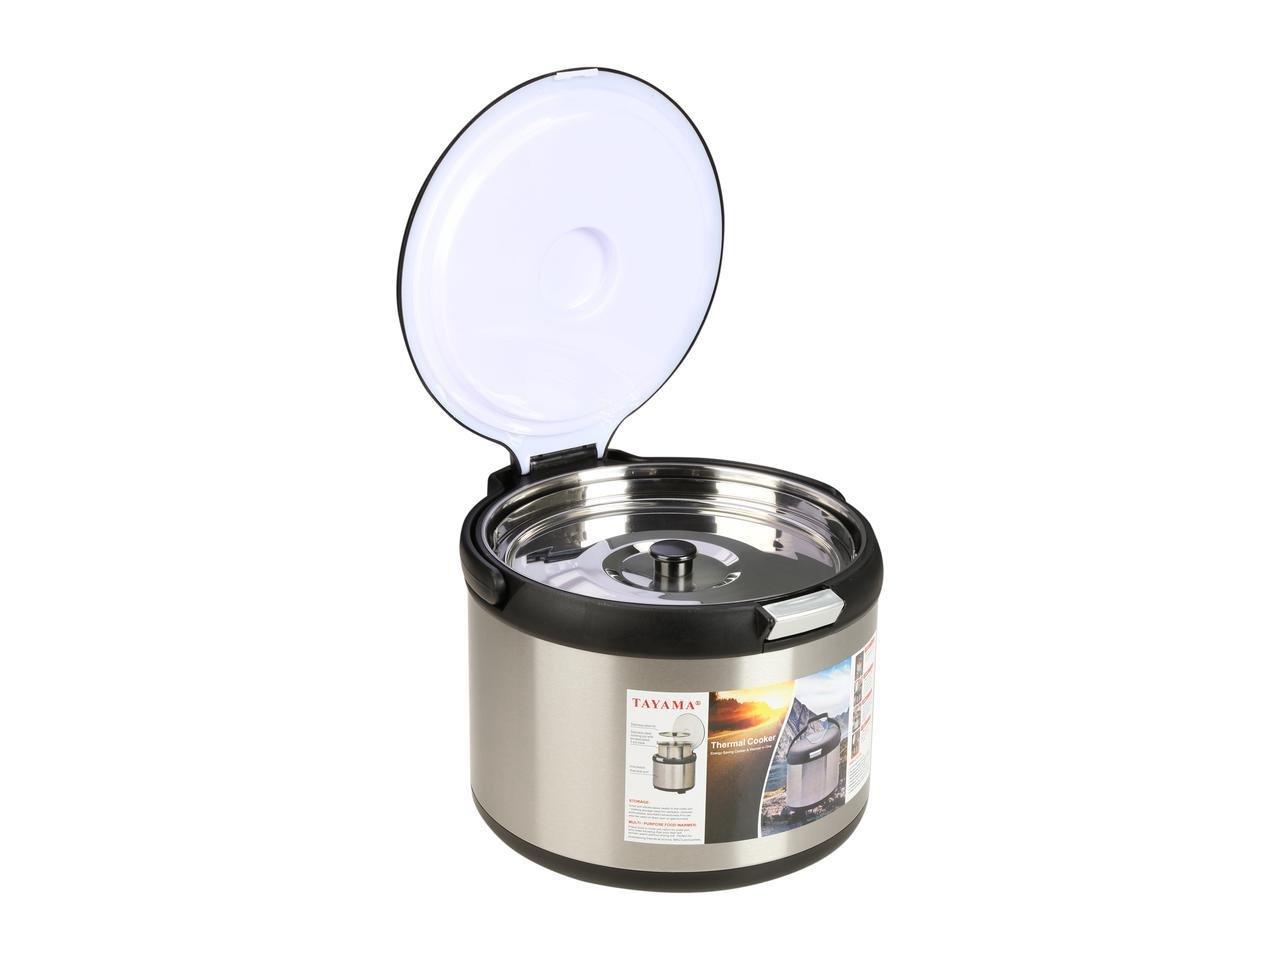 Tayama TXM-50CF Energy-Saving Thermal Cooker, 5 L, Black by TAYAMA (Image #6)